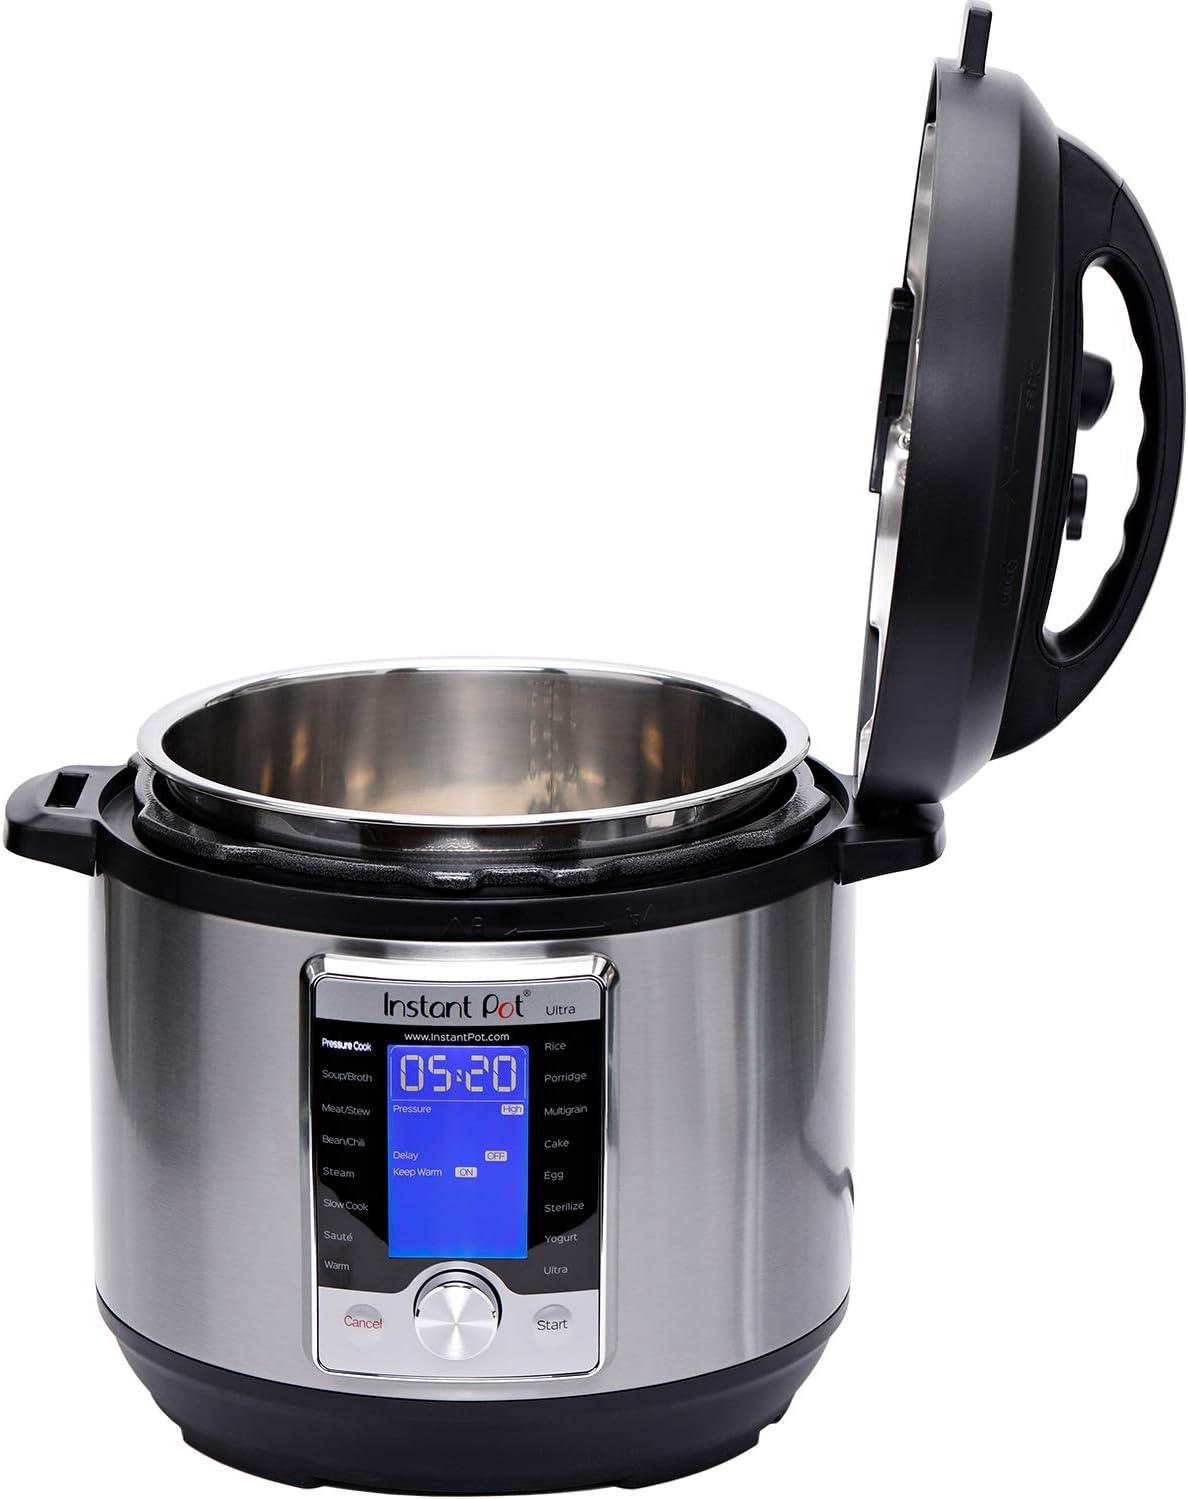 Instant Pot Ultra 10-in-1